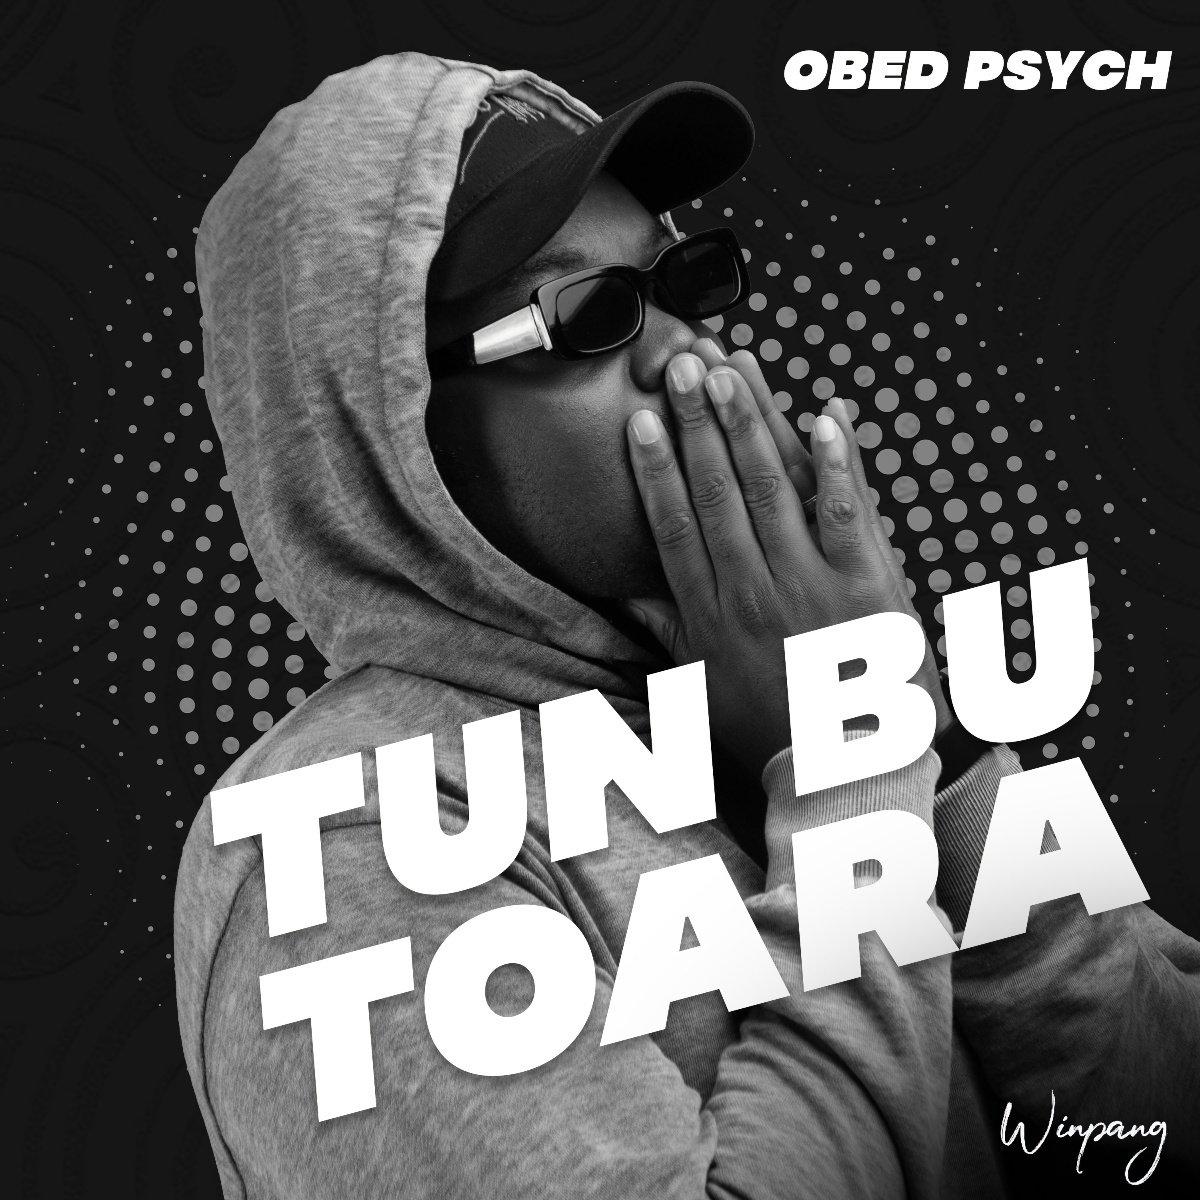 Lyrics: Tun Bu Toara by Obed Psych